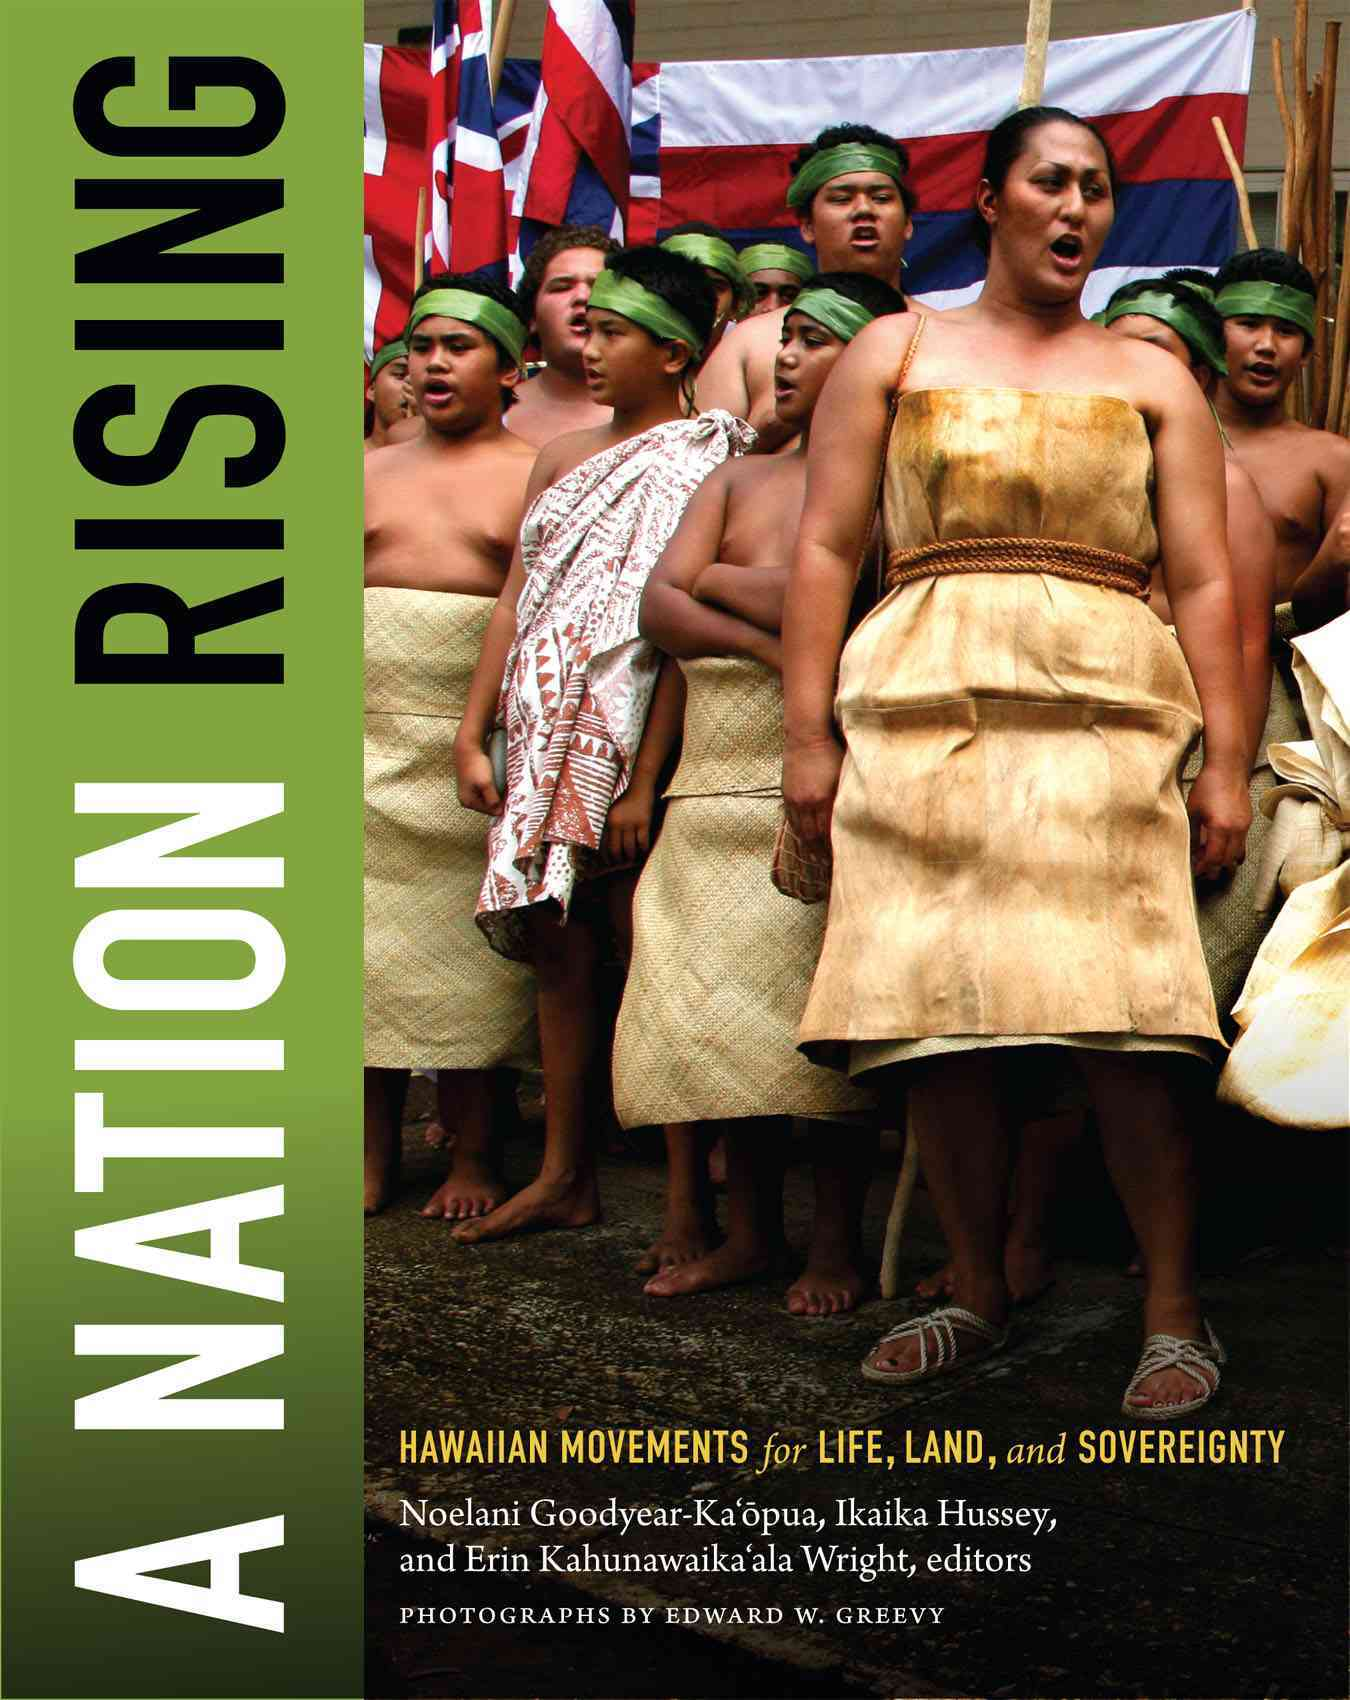 A Nation Rising By Goodyear-ka'opua, Noelani (EDT)/ Hussey, Ikaika (EDT)/ Wright, Erin Kahunawaika'ala (EDT)